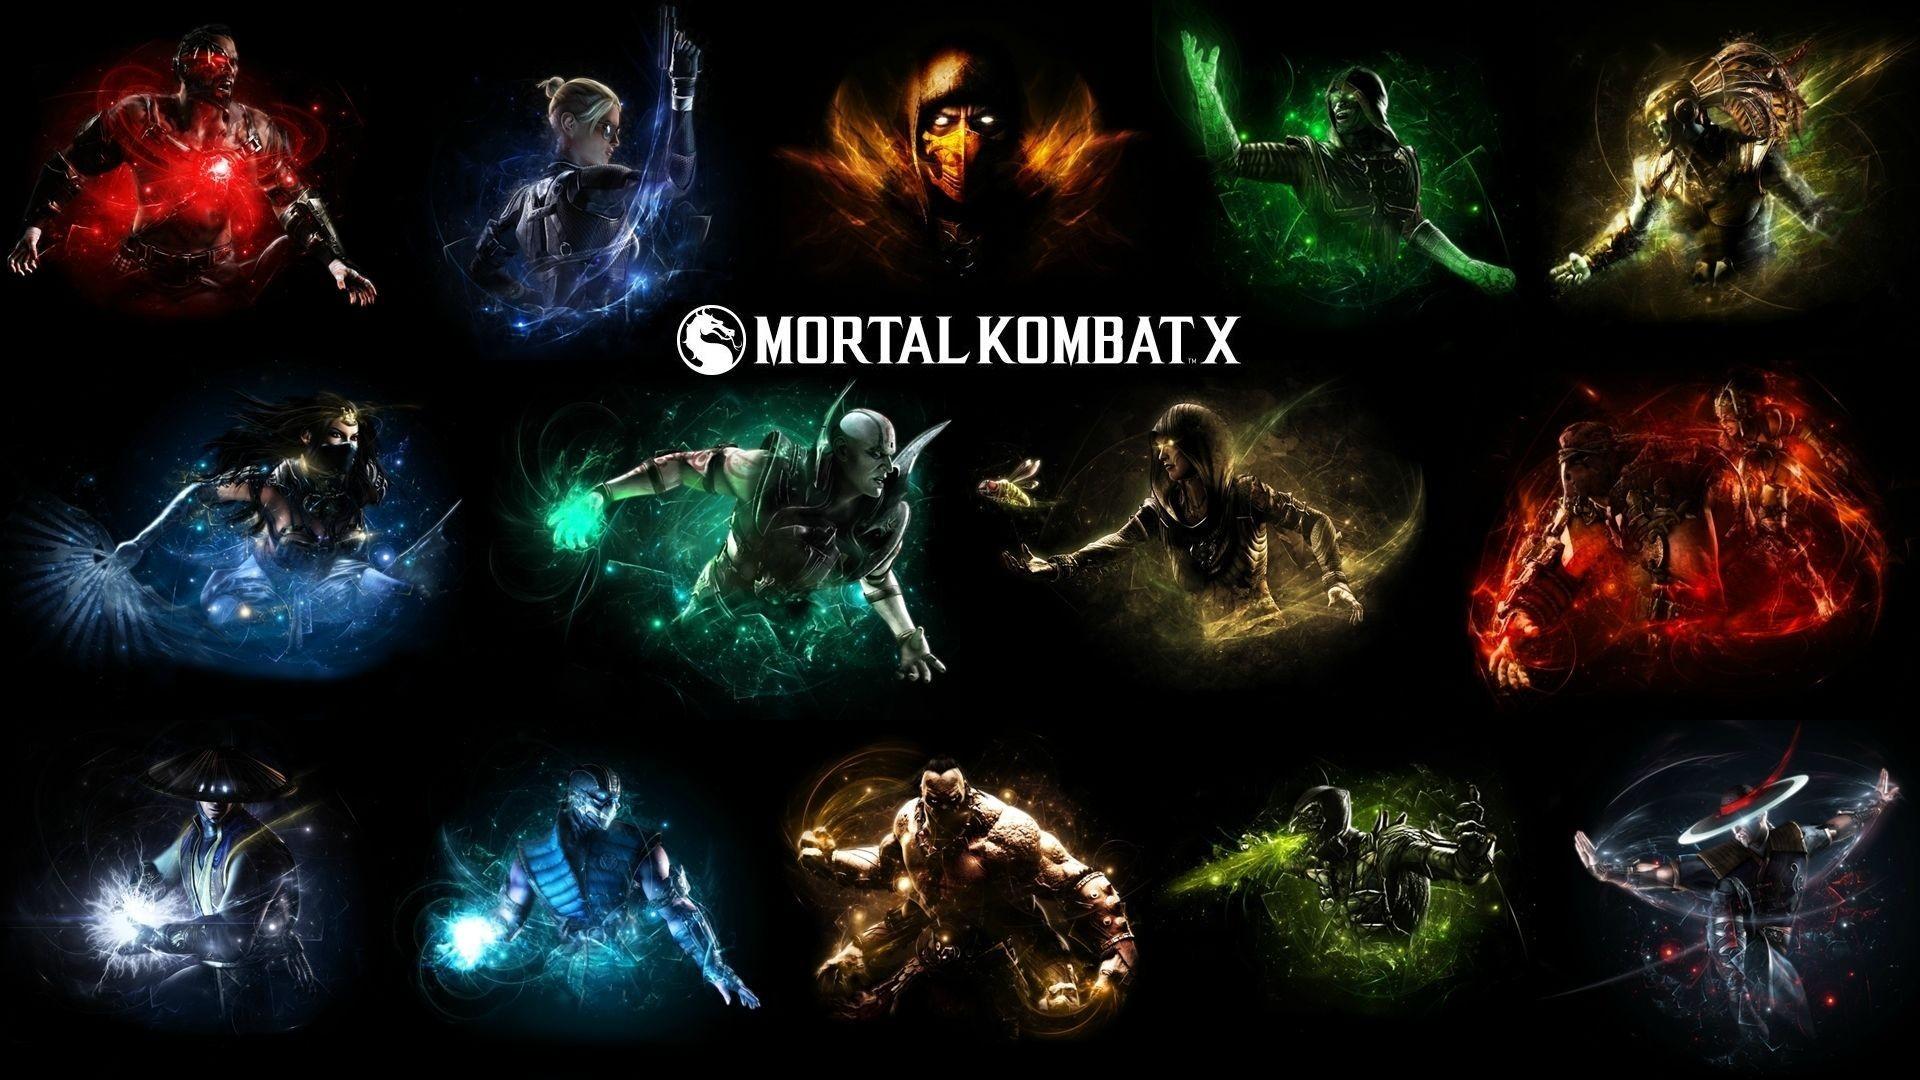 Scorpion Mortal Kombat X 4k Dk Mortal Kombat 11 Wallpaper Hd